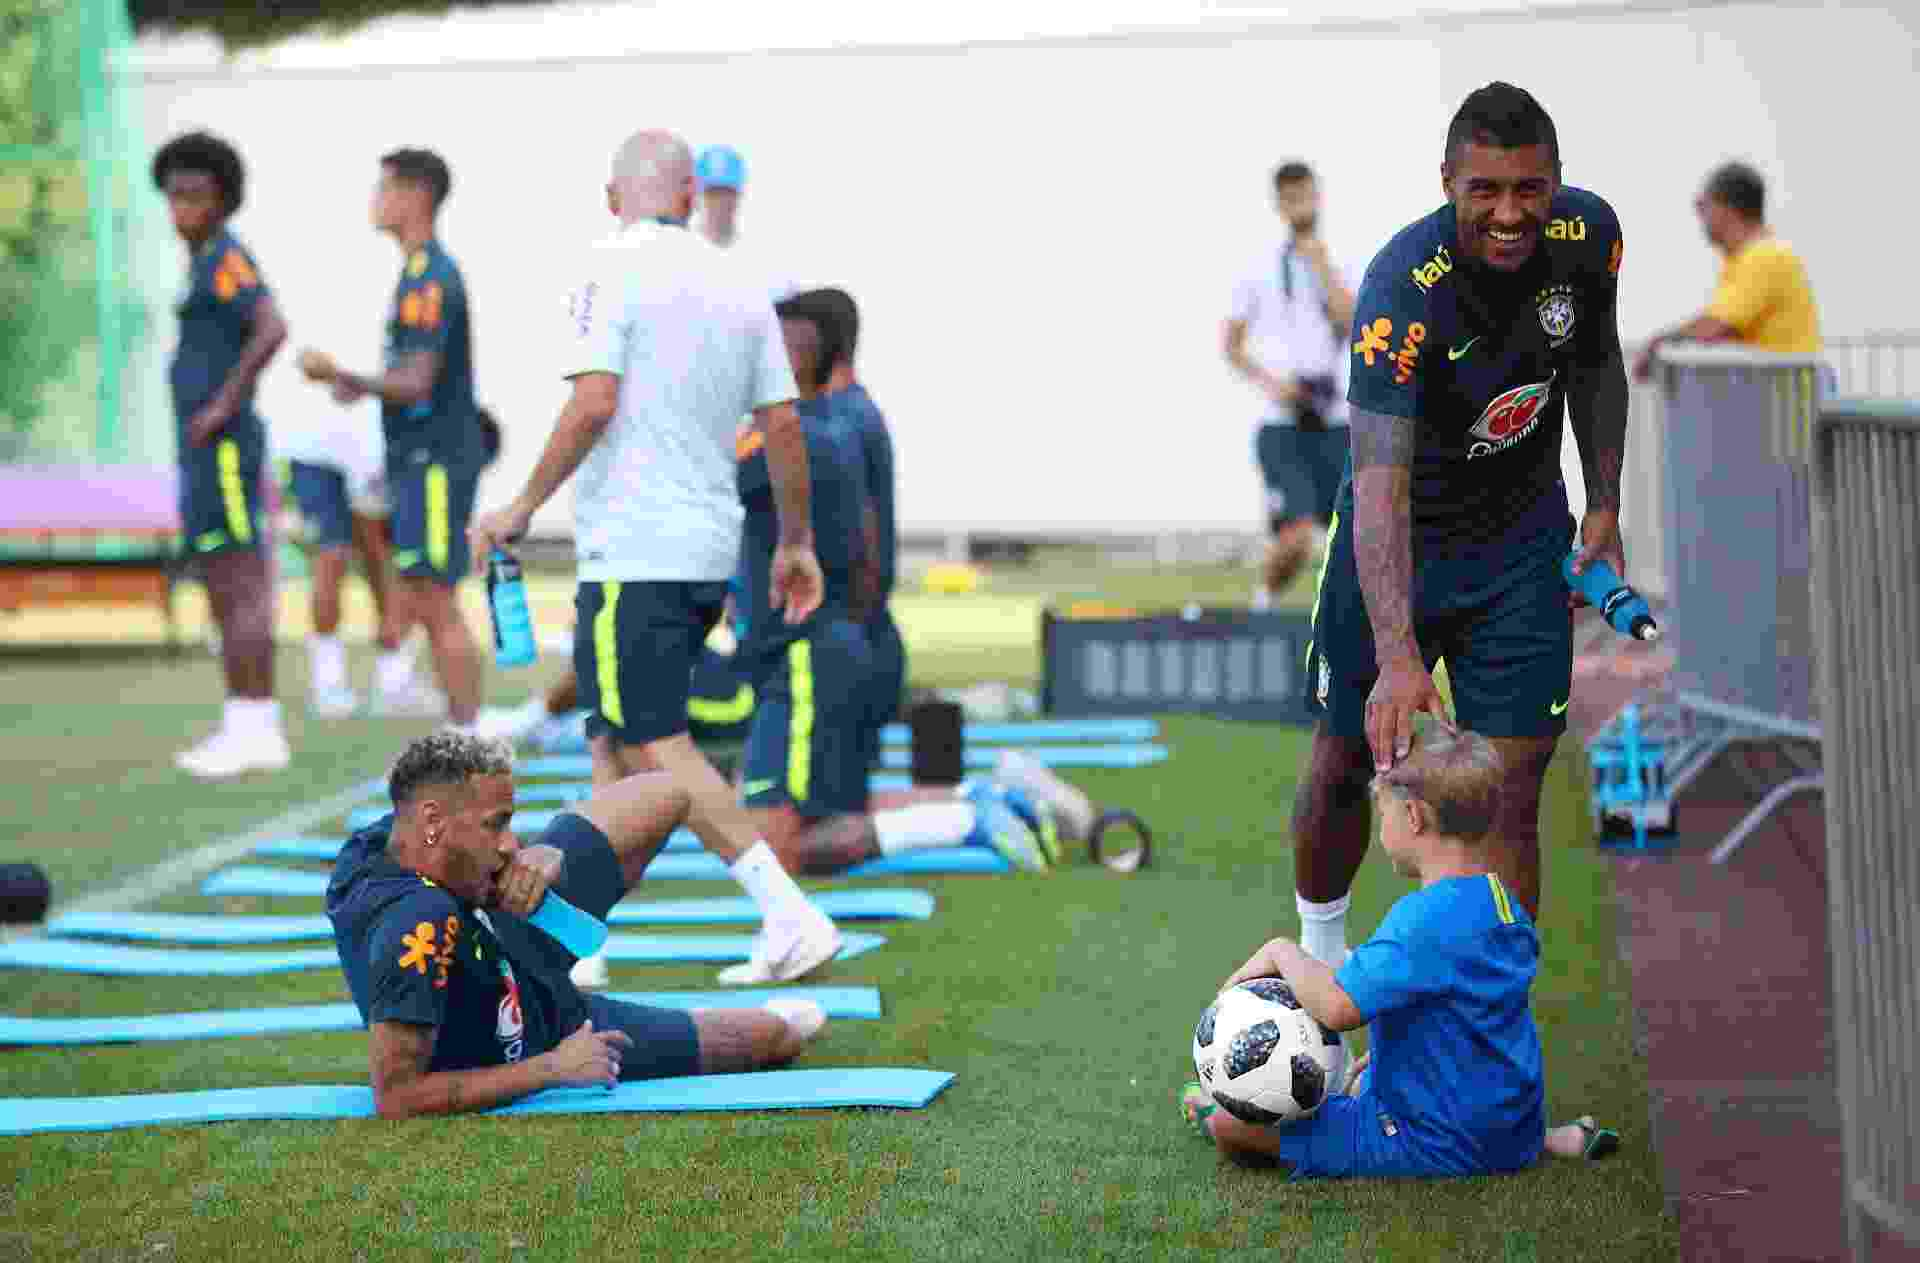 Paulinho brinca com Davi Lucca, filho de Neymar - REUTERS/Hannah McKay